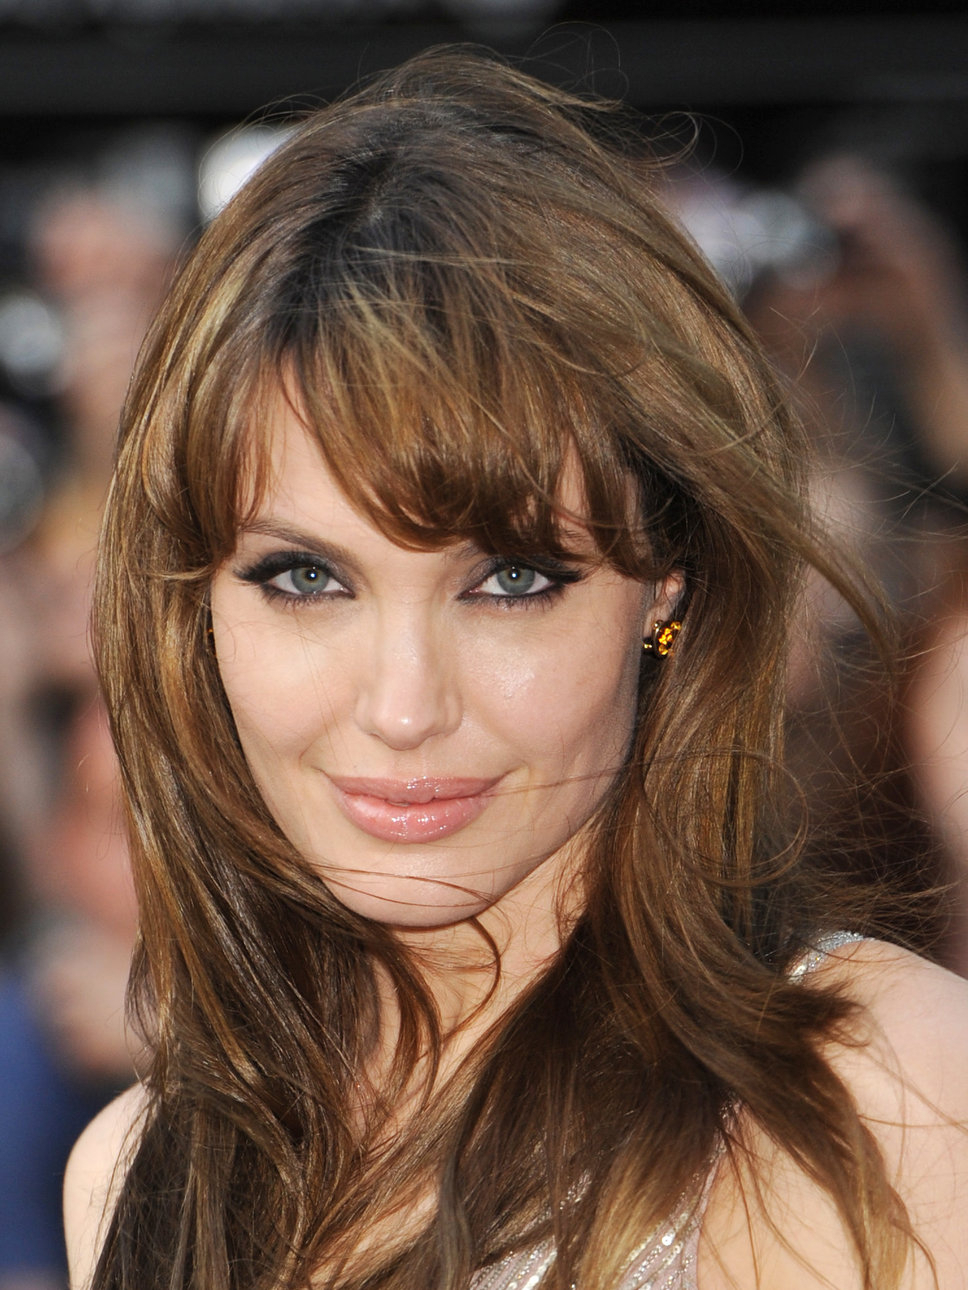 ? Angelina Jolie Hairstyles 2014 | Long Hairs Cut Pictures With Angelina Jolie Short Hairstyles (View 25 of 25)